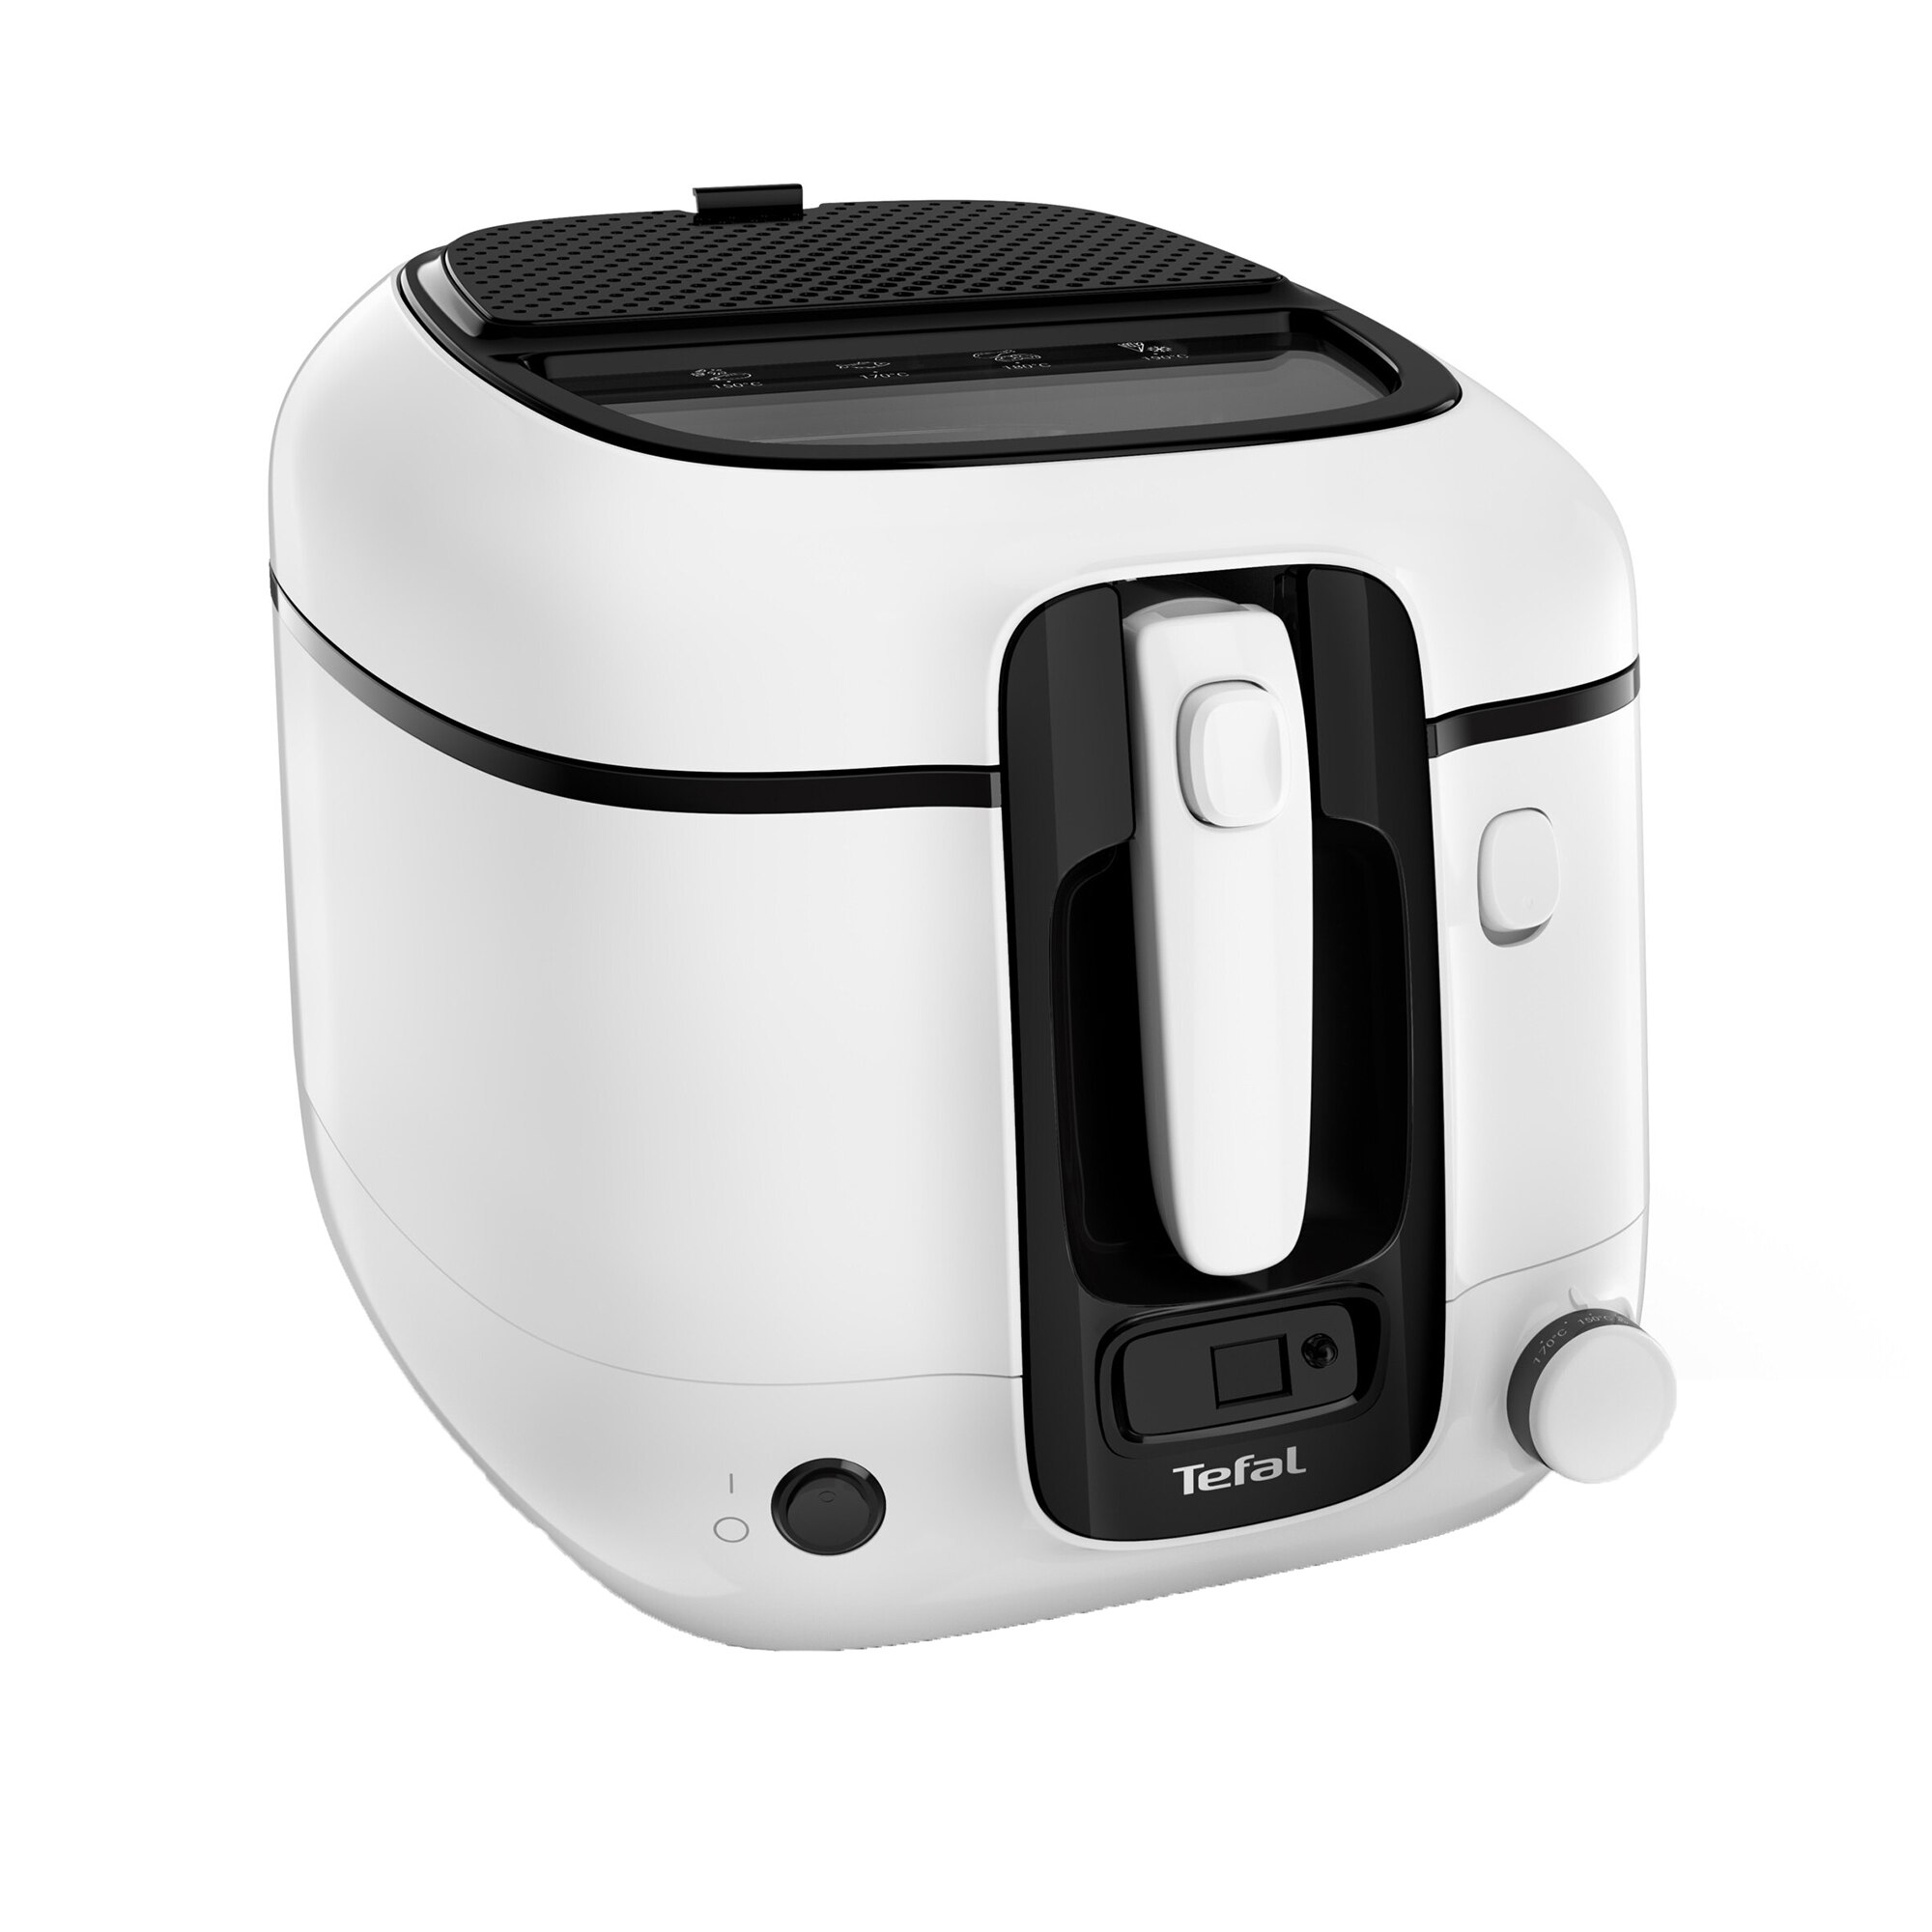 Fotografie Friteuza TEFAL Super Uno FR314030, capacitate preparare 1.5KG, filtru miros, termostat ajustabil 190°C, Alb